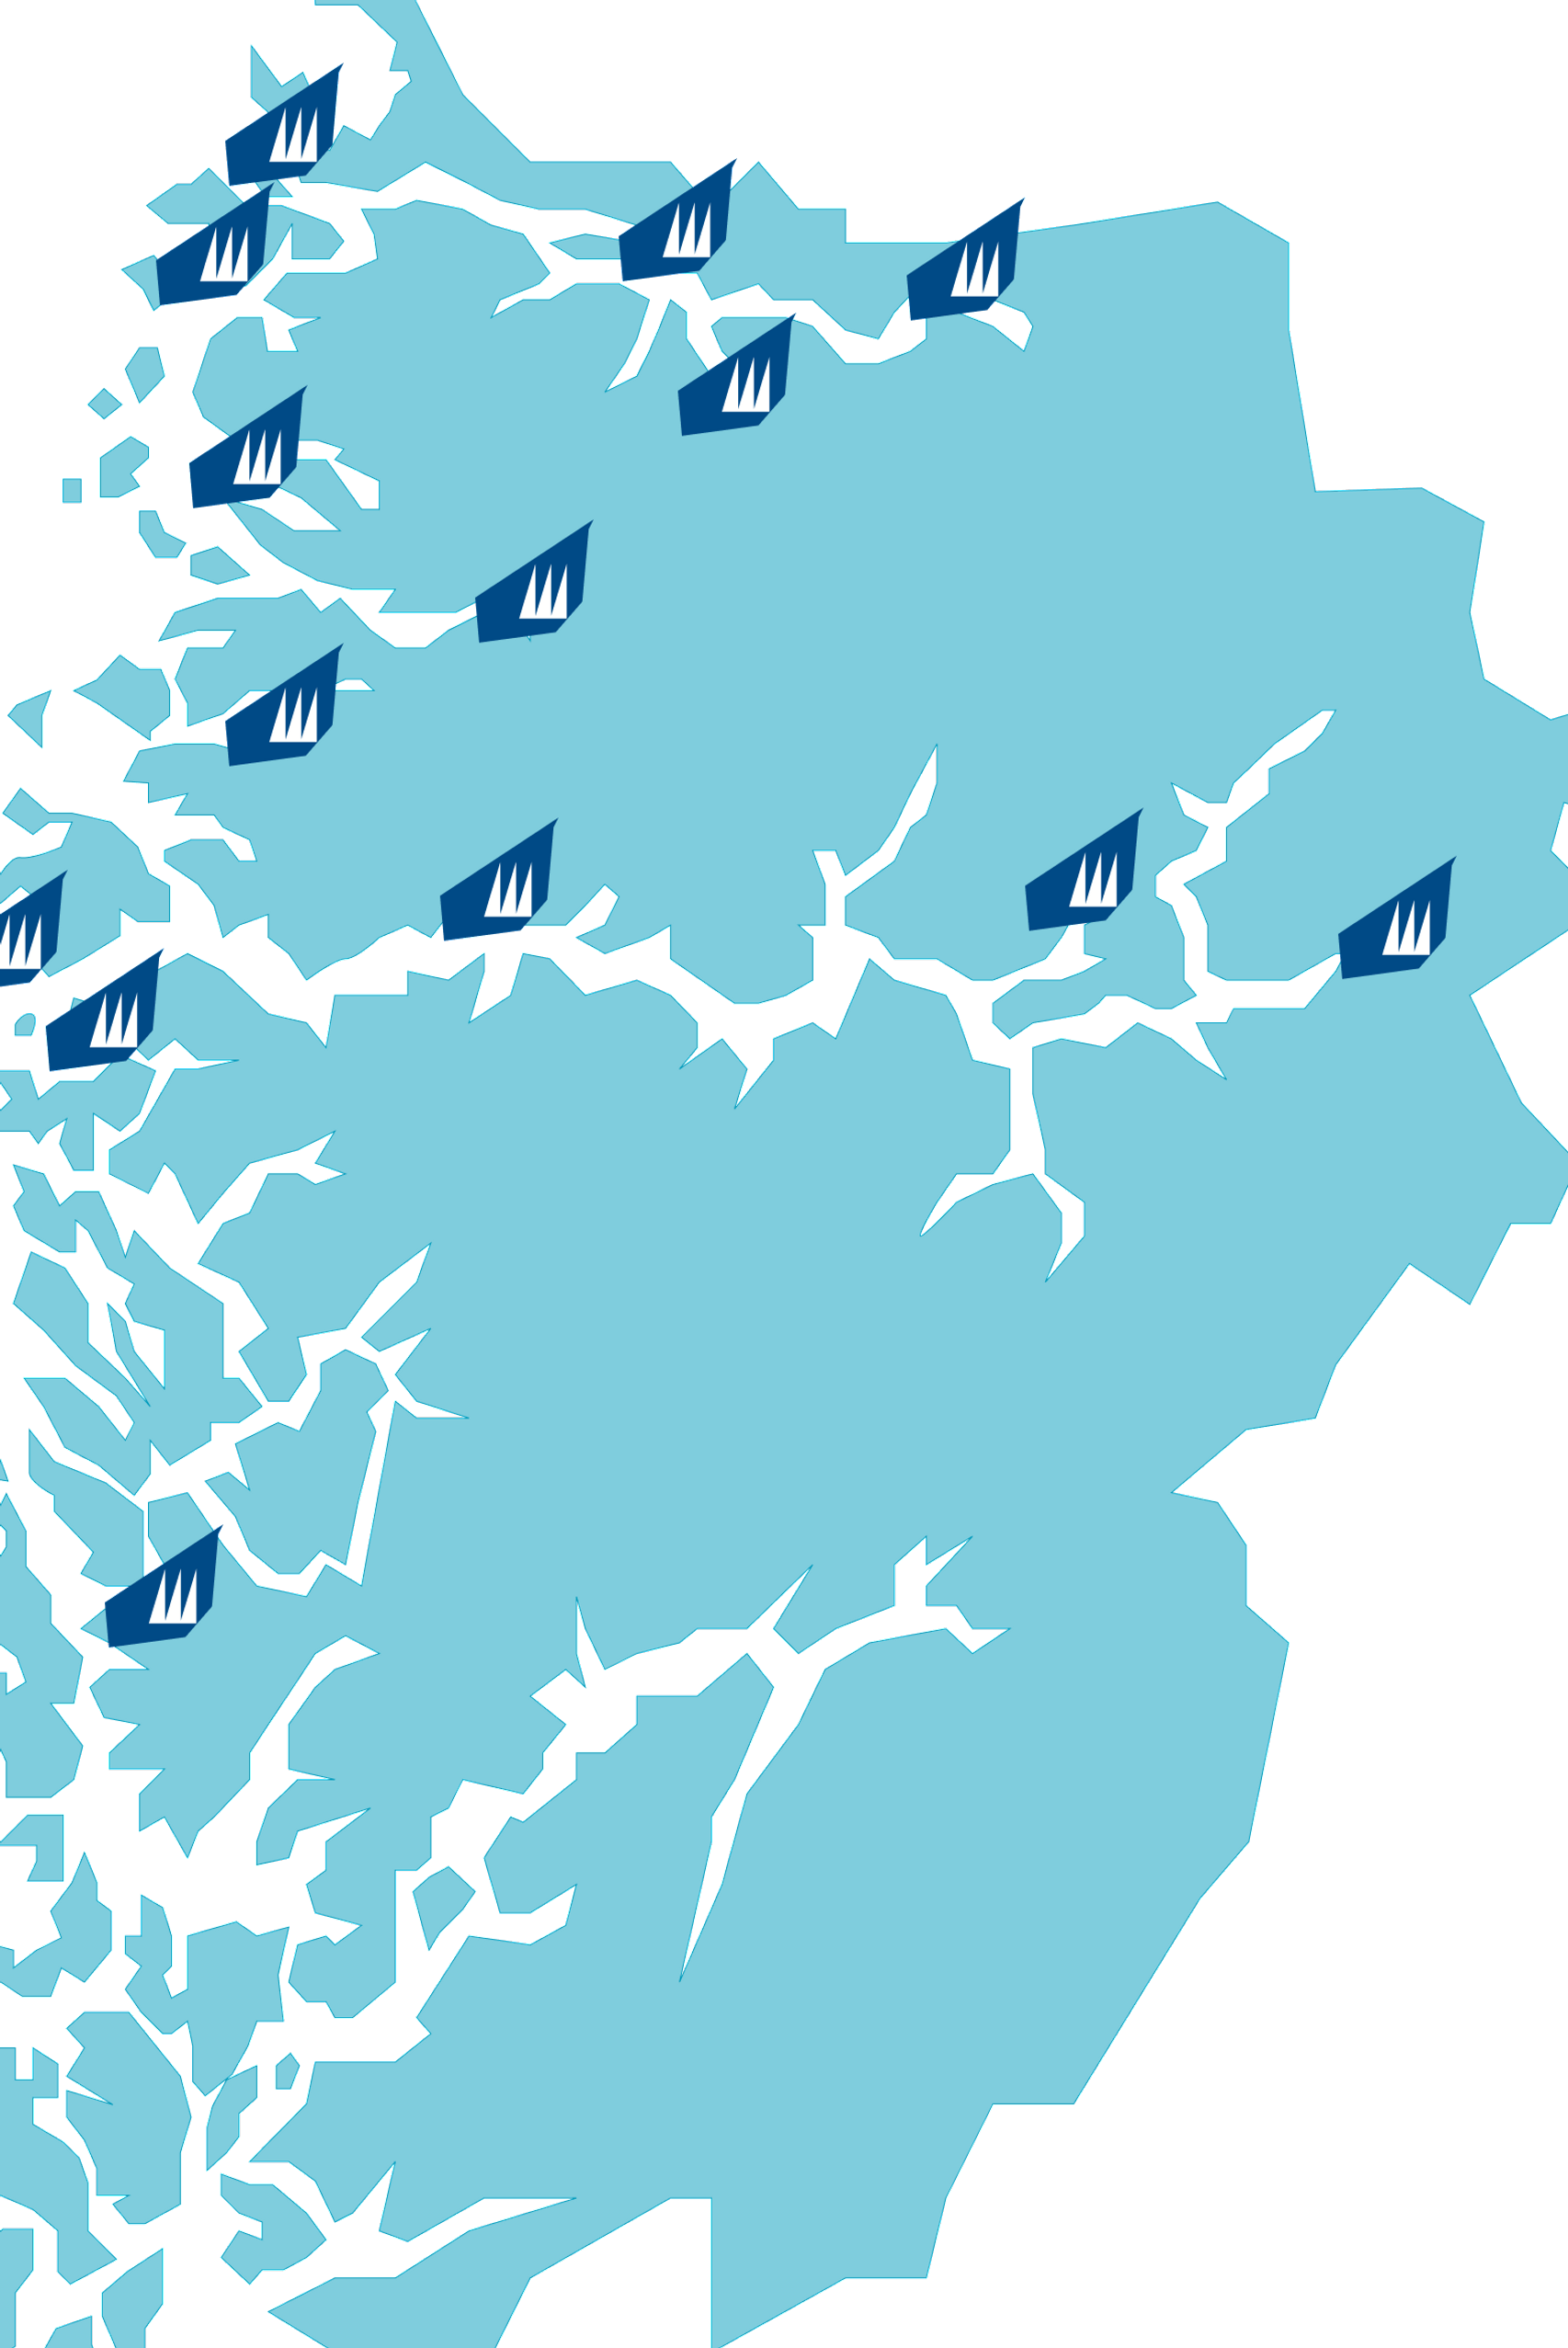 Kart over Vestland Fylke